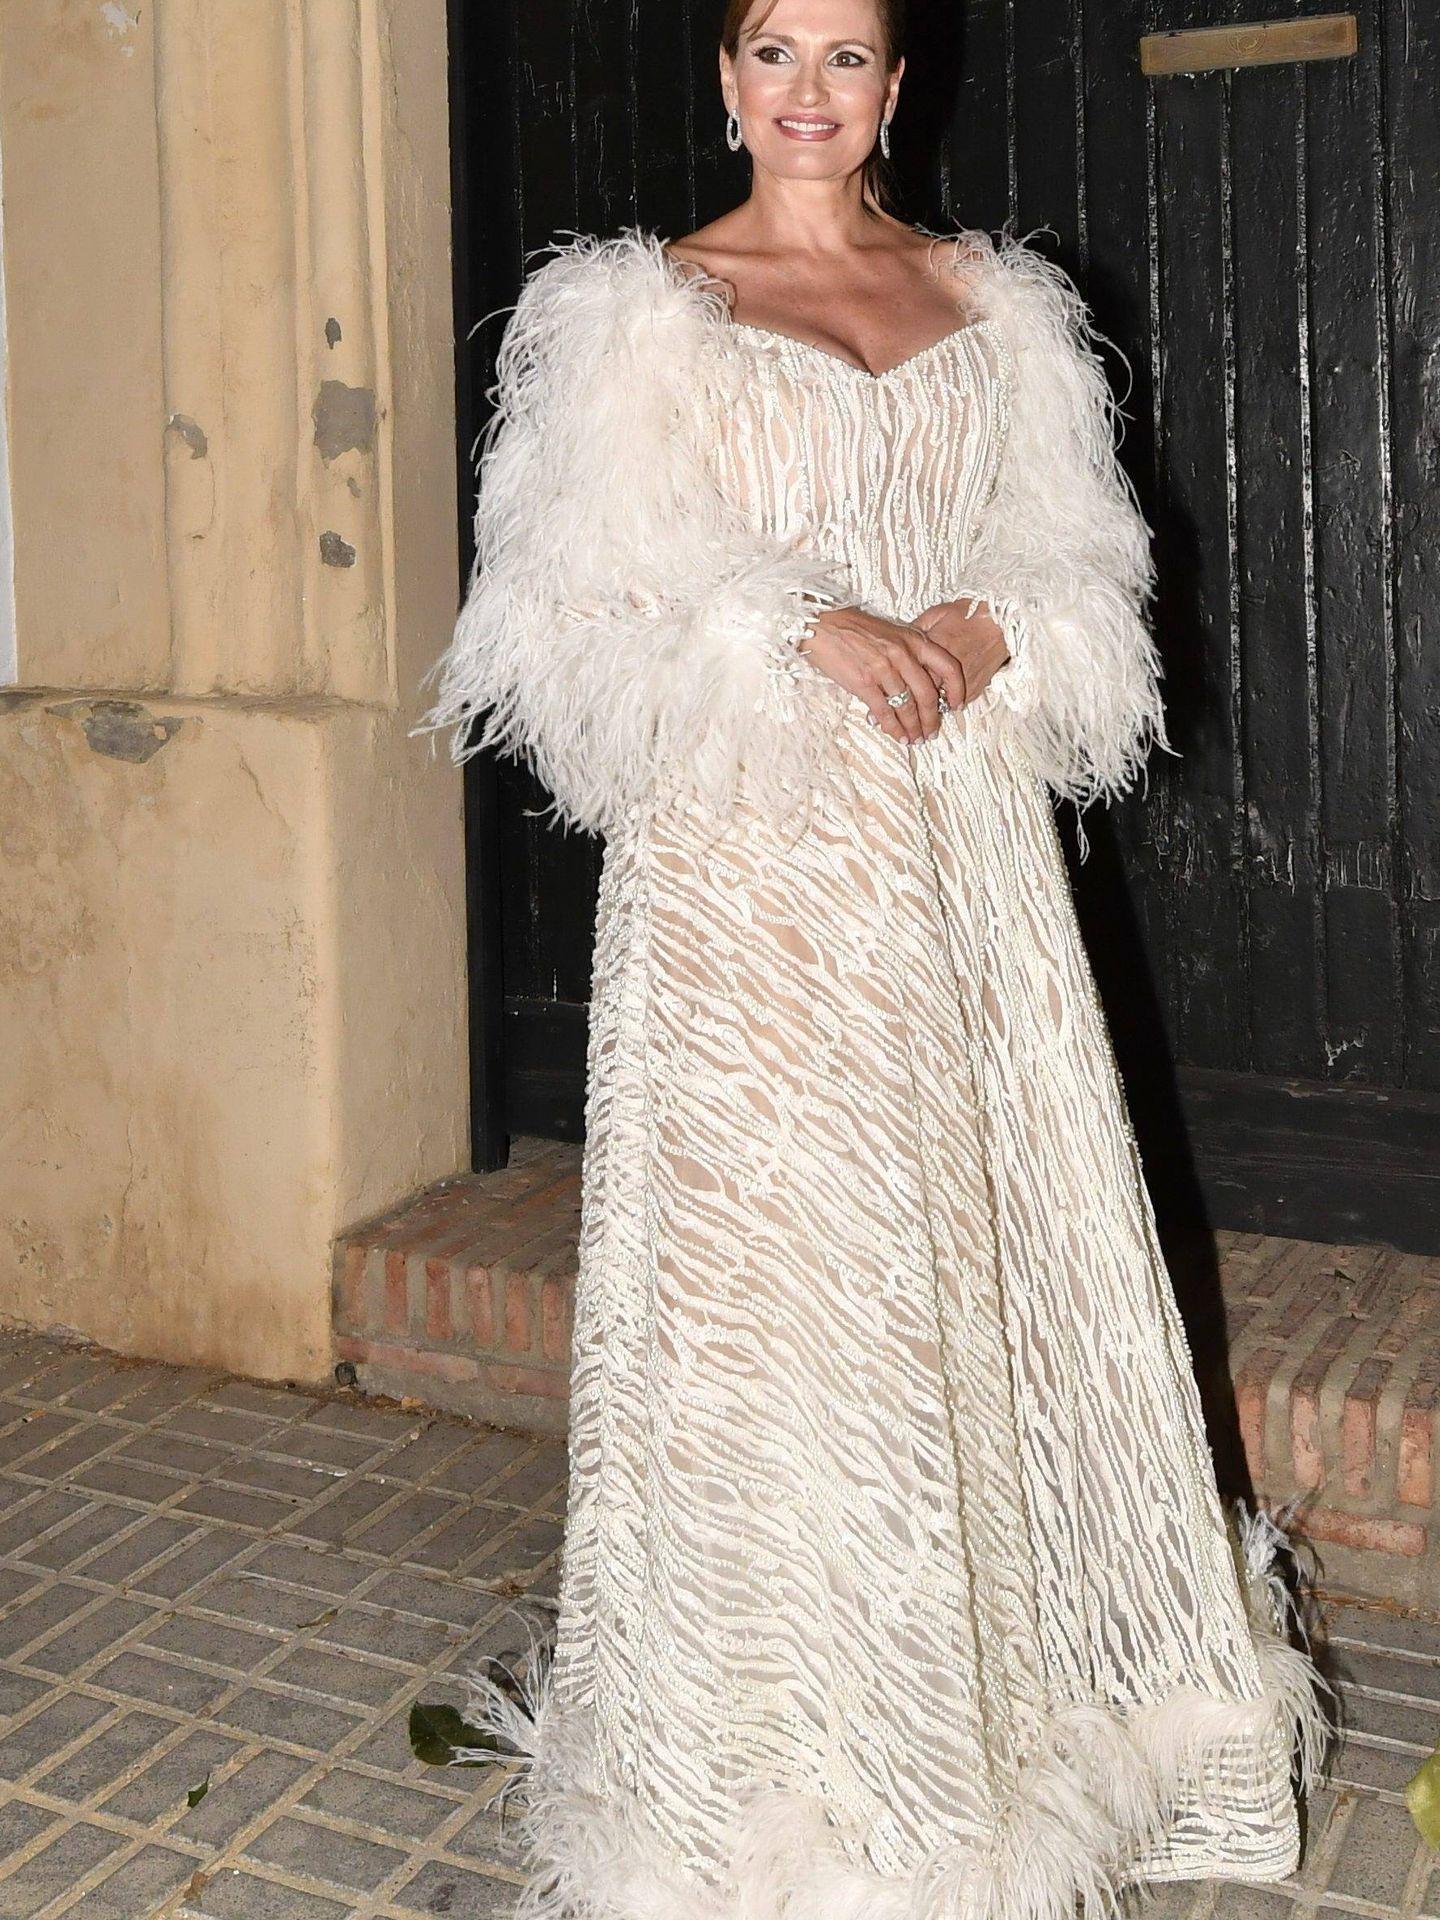 Ainhoa Arteta en su fiesta prenupcial. (Cordon Press)